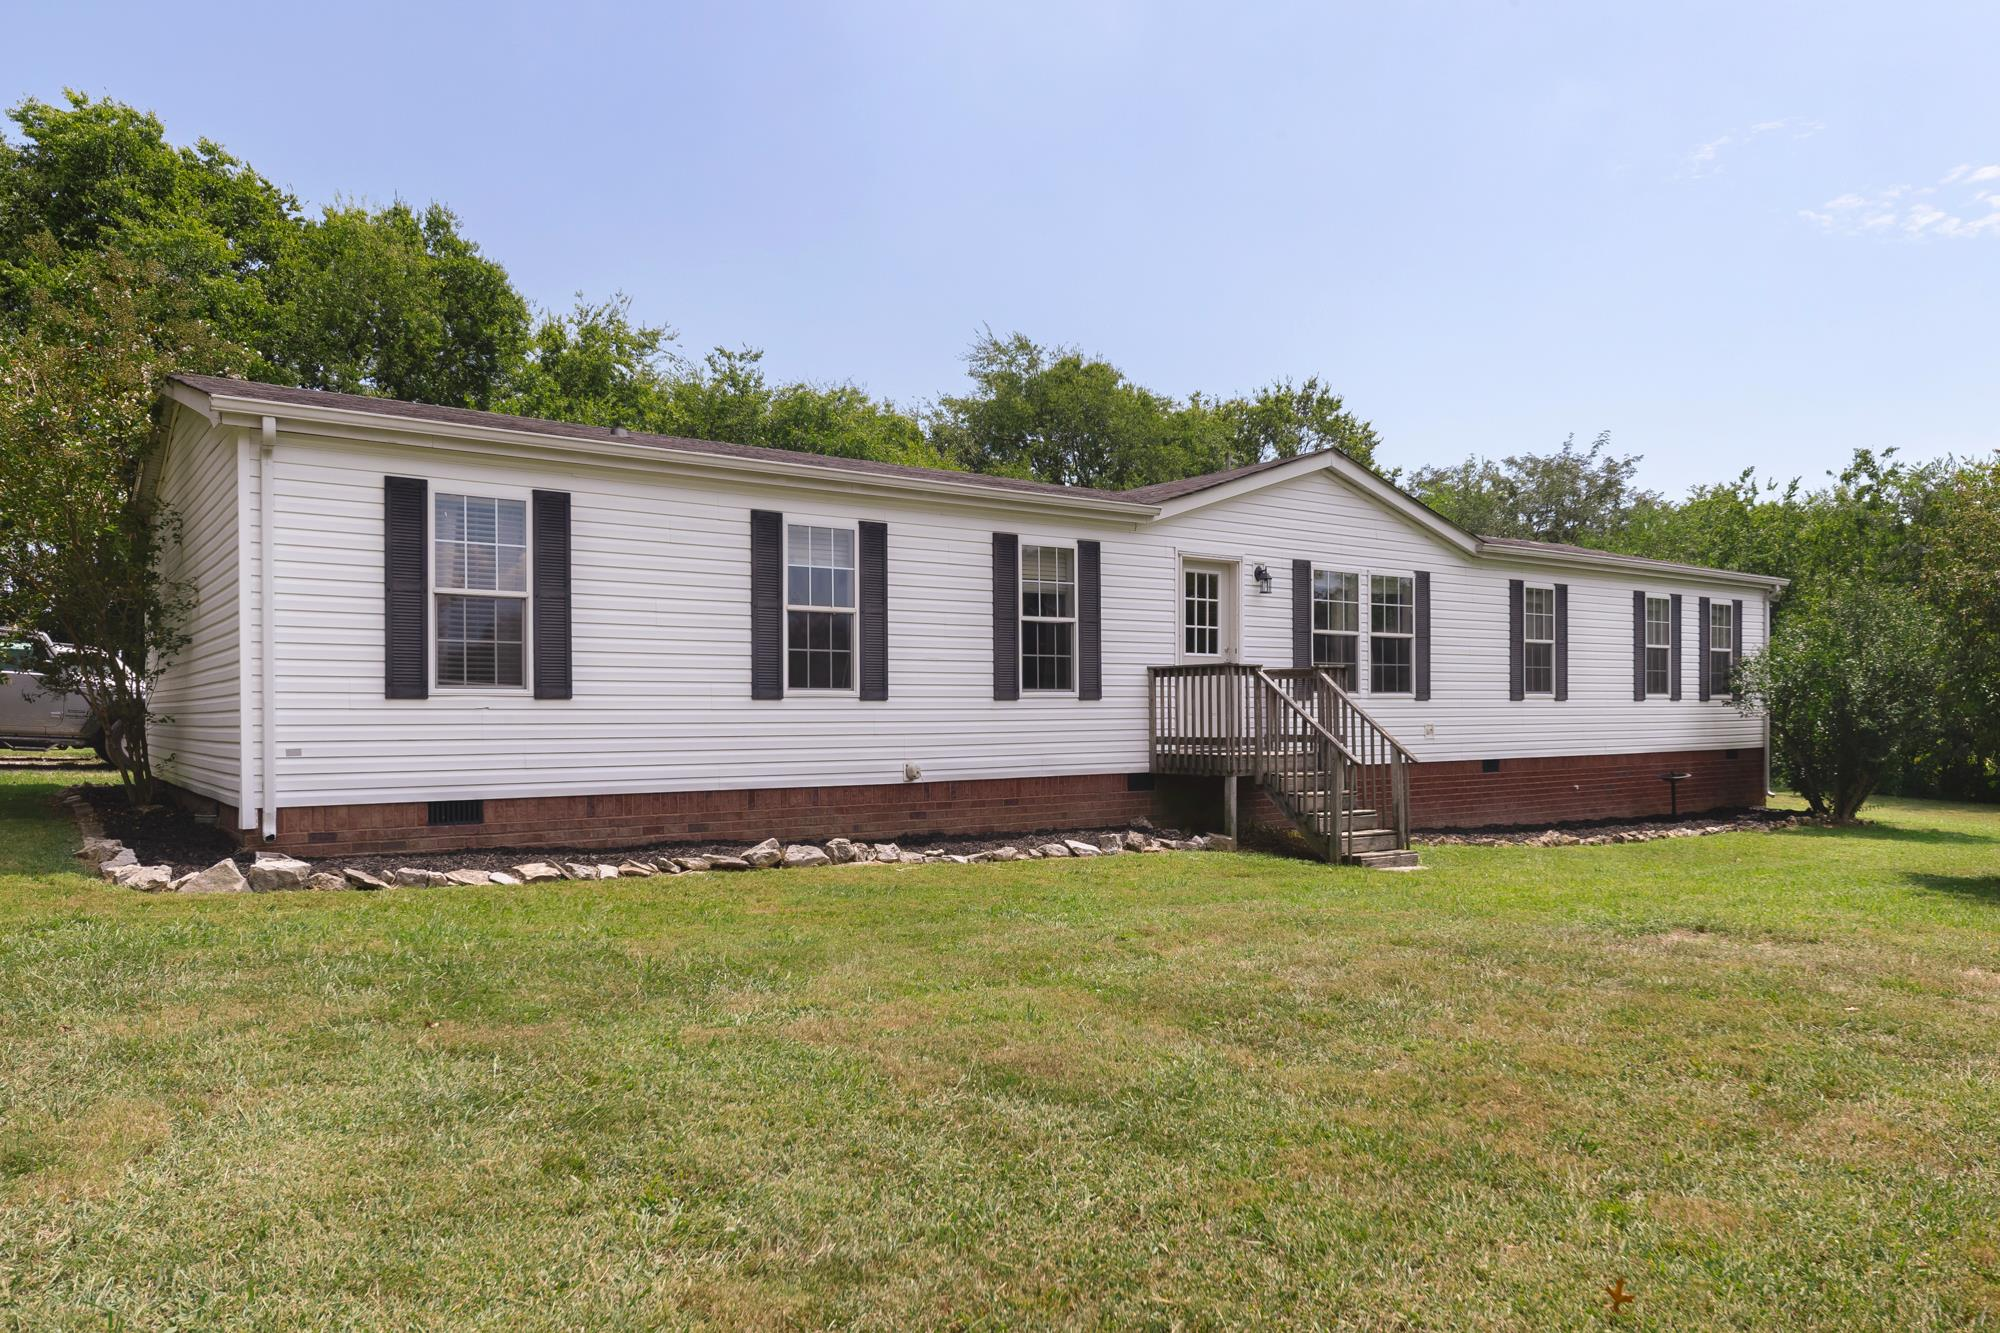 1232 Littleton Ranch Rd, Castalian Springs, TN 37031 - Castalian Springs, TN real estate listing